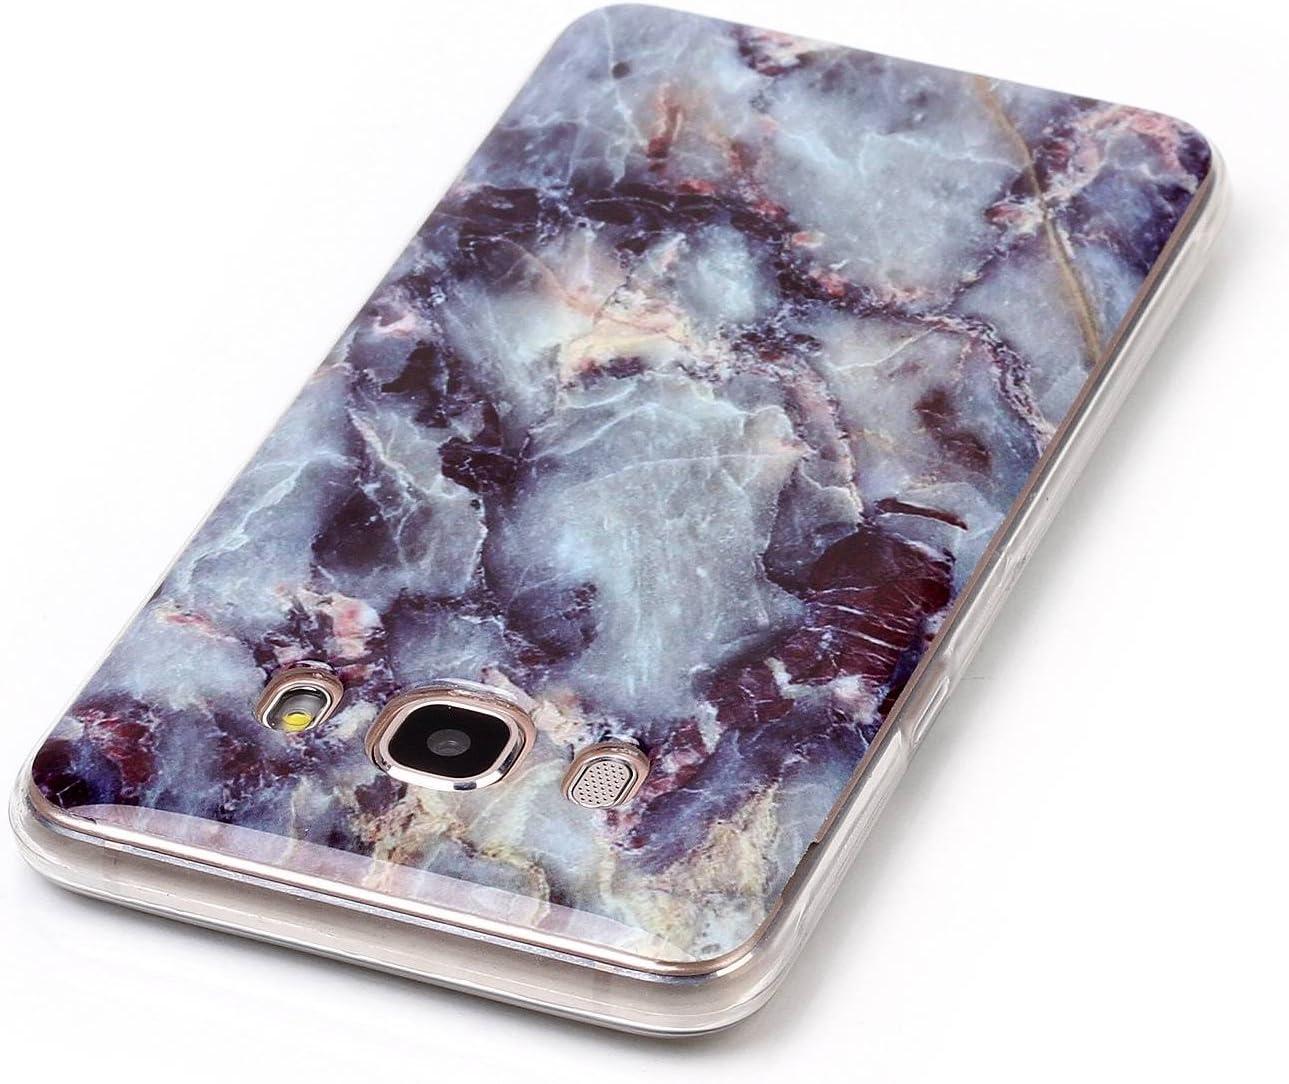 Homikon Silikon H/ülle Marmor Muster TPU Handyh/ülle Ultra D/ünn Matt Weiche Schutzh/ülle Sto/ßd/ämpfend R/ückseite Soft Flexibel Tasche Case Cover Bumper Kompatibel mit Samsung Galaxy J5 2016 #5